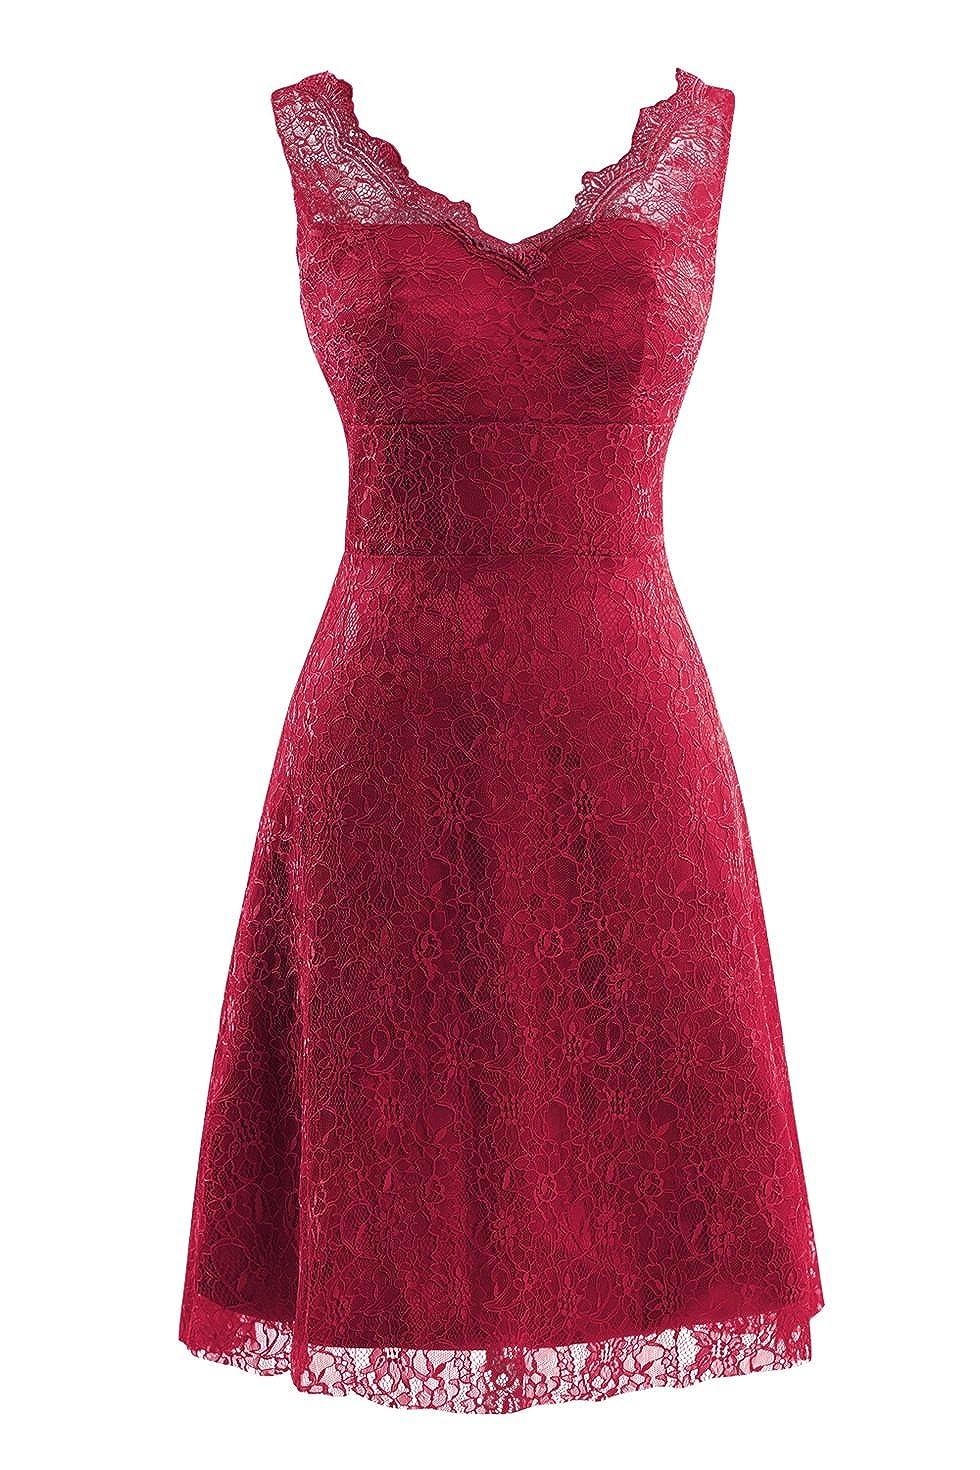 Burgundy Bess Bridal Women's V Neck Lace Knee Length Prom Party Dresses